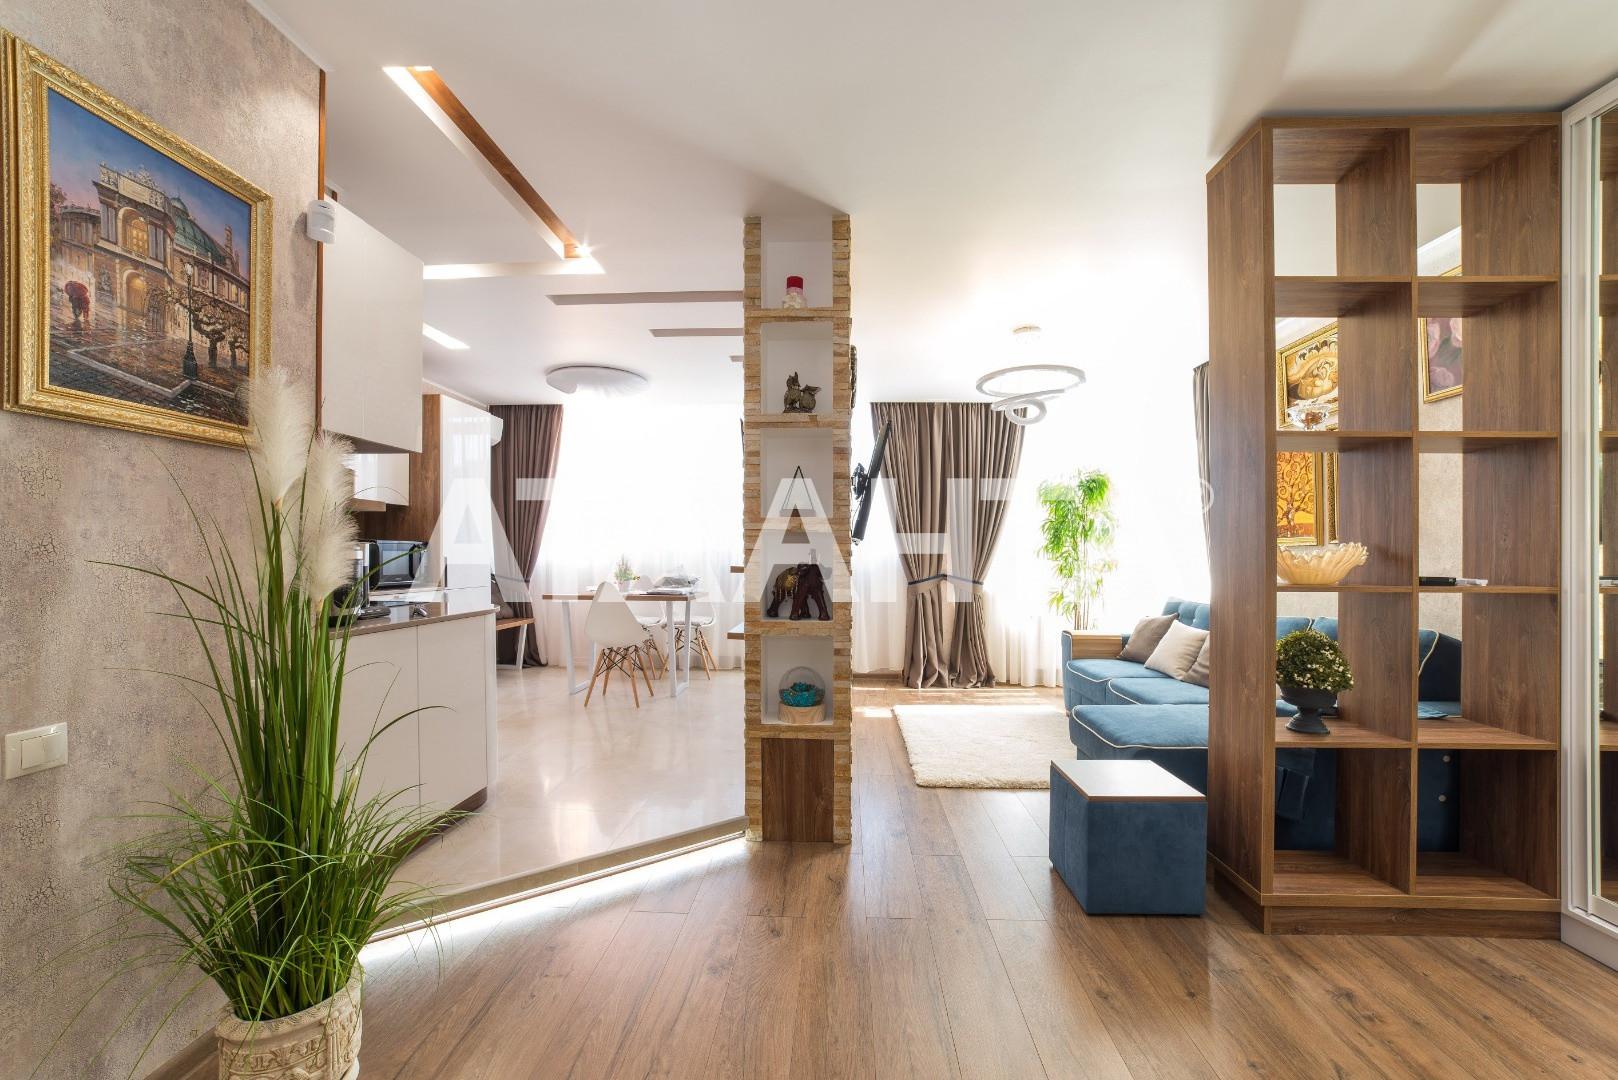 Продается 1-комнатная Квартира на ул. Балковская (Фрунзе) — 50 000 у.е. (фото №2)